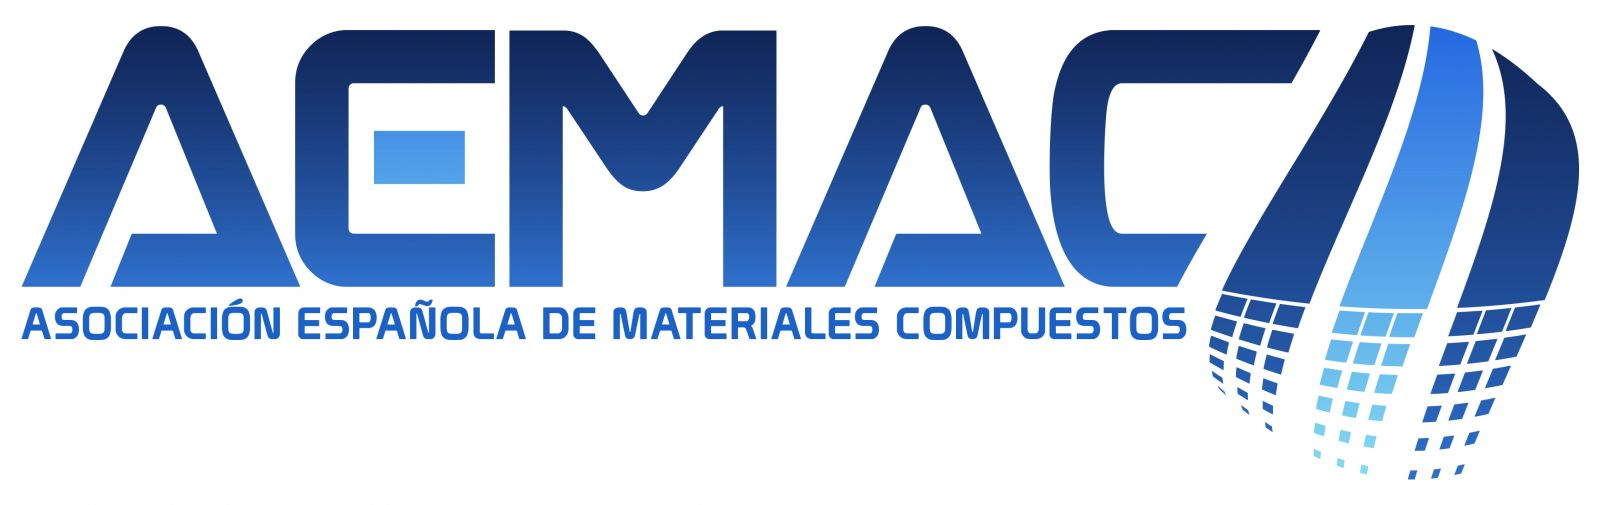 AEMAC-2